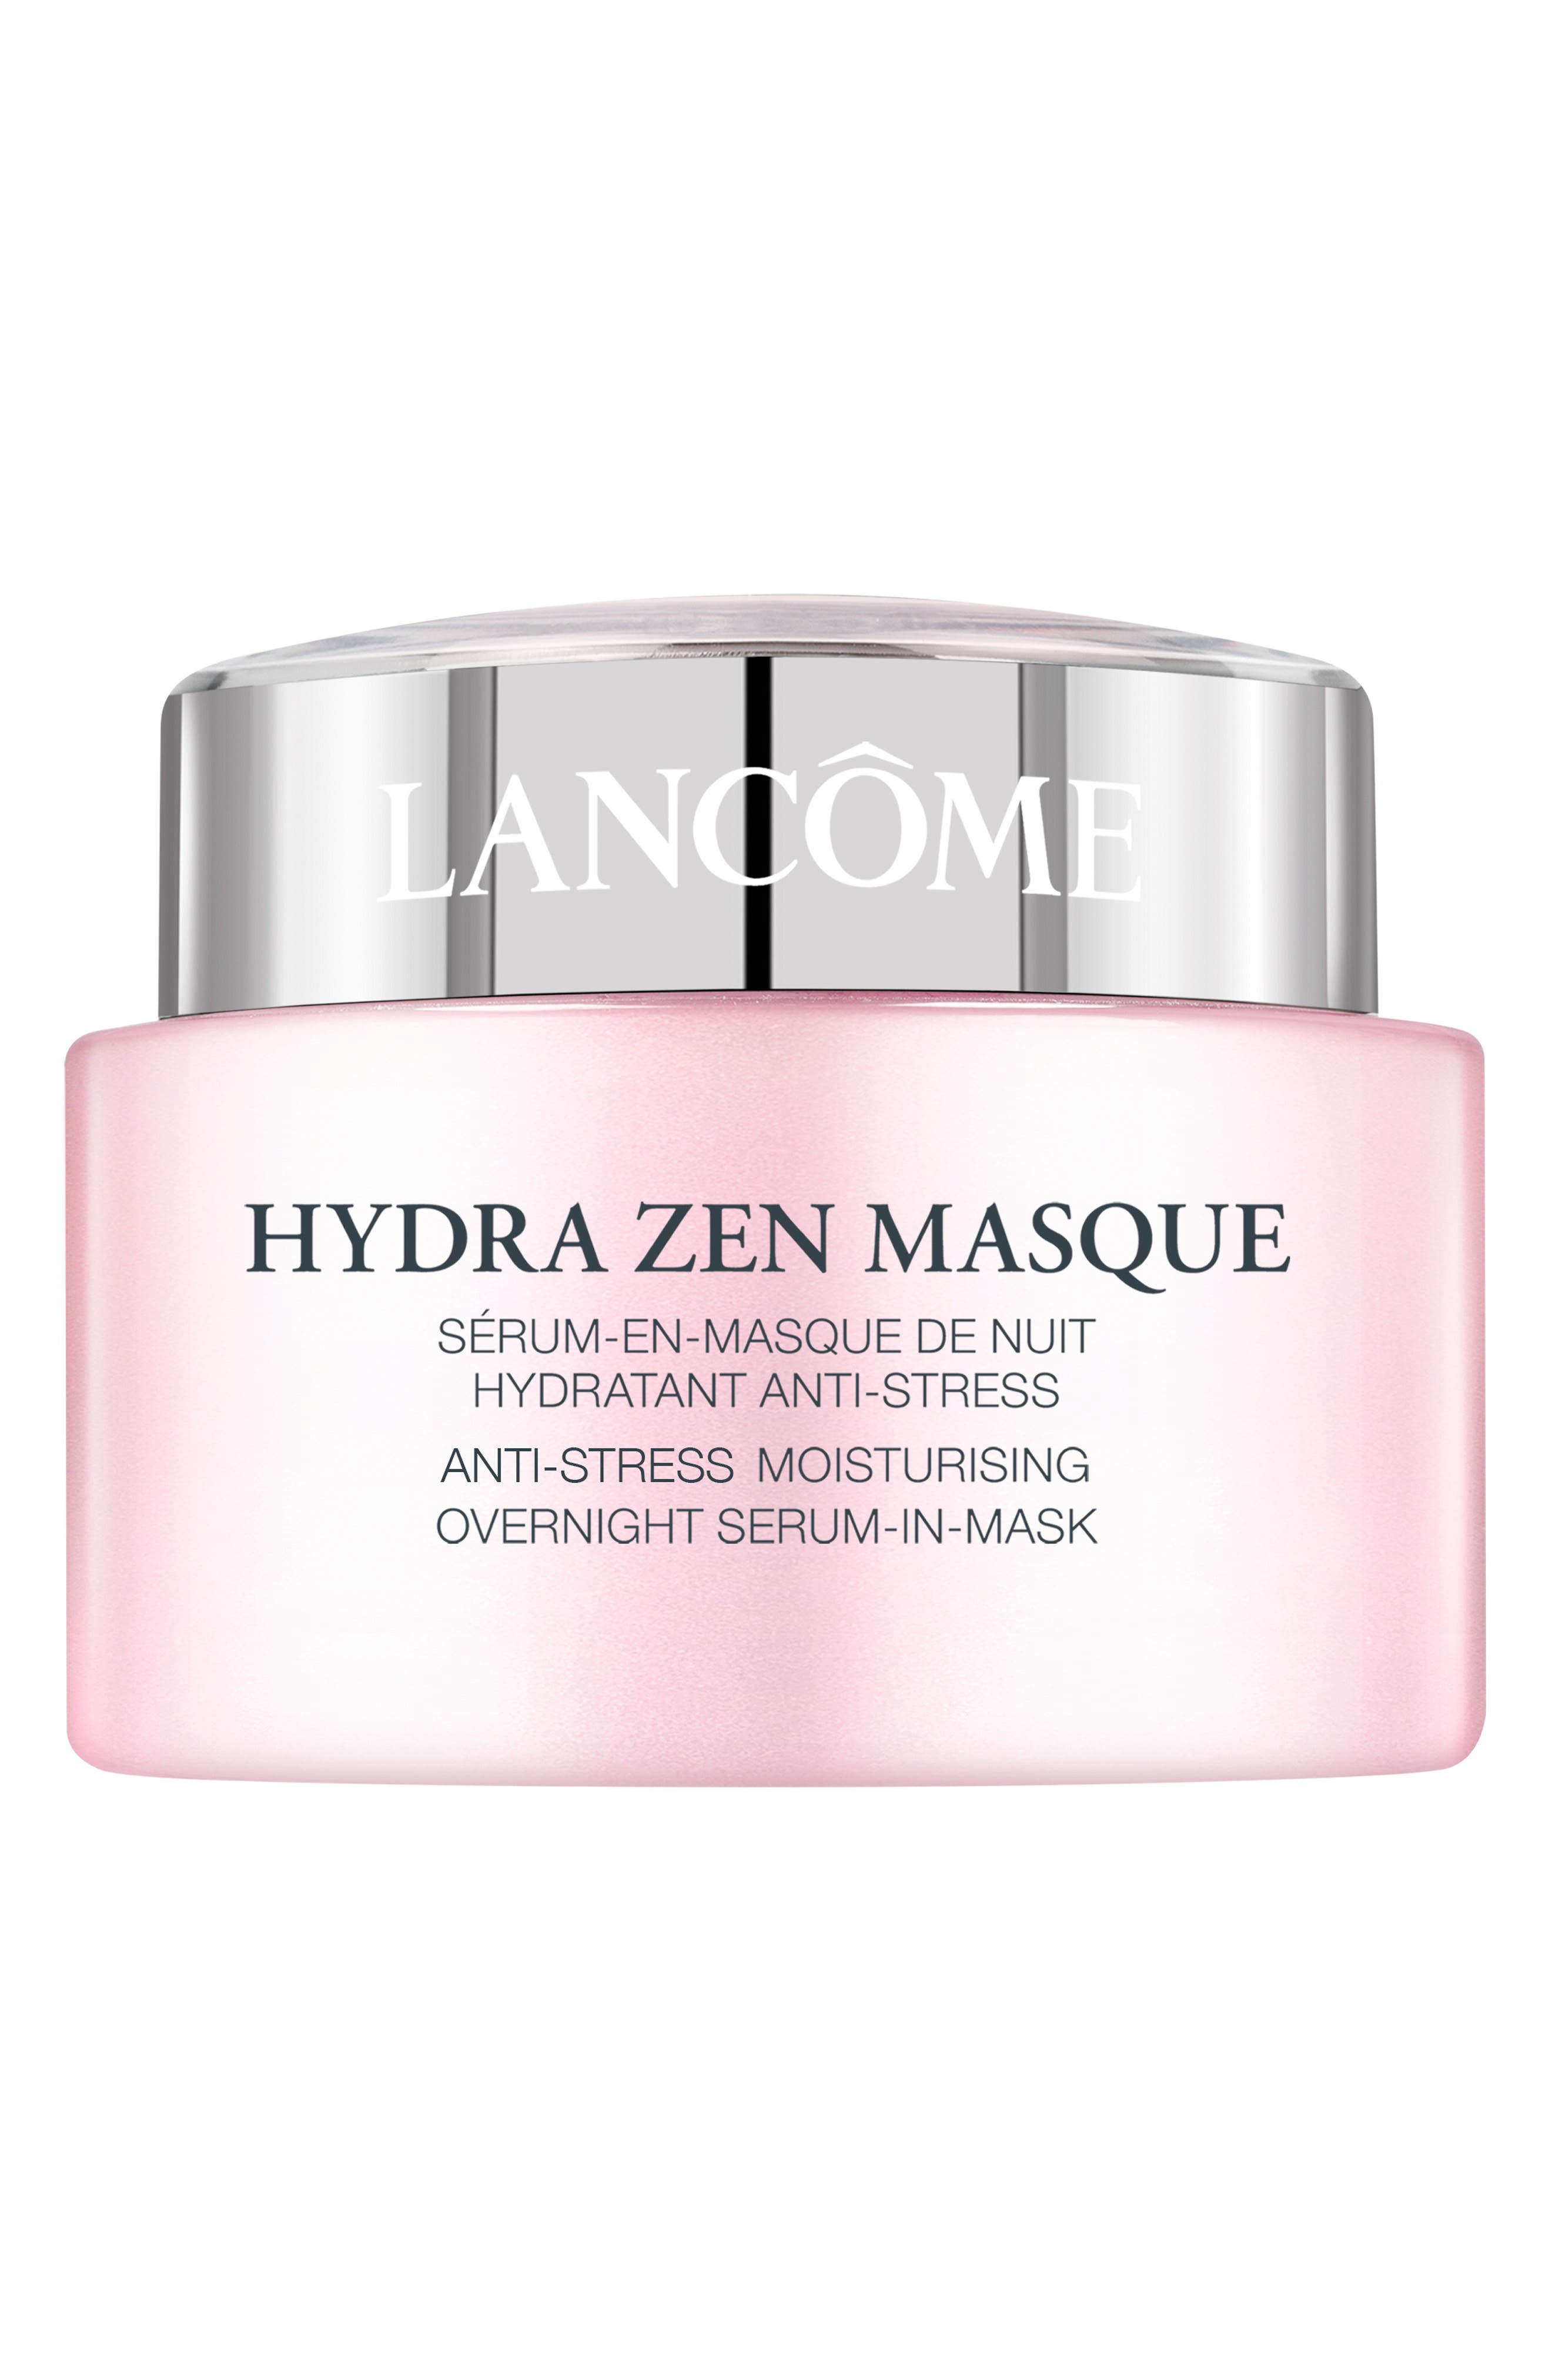 Hydra Zen Anti-Stress Moisturizing Overnight Serum-in-Mask,                             Alternate thumbnail 2, color,                             NO COLOR